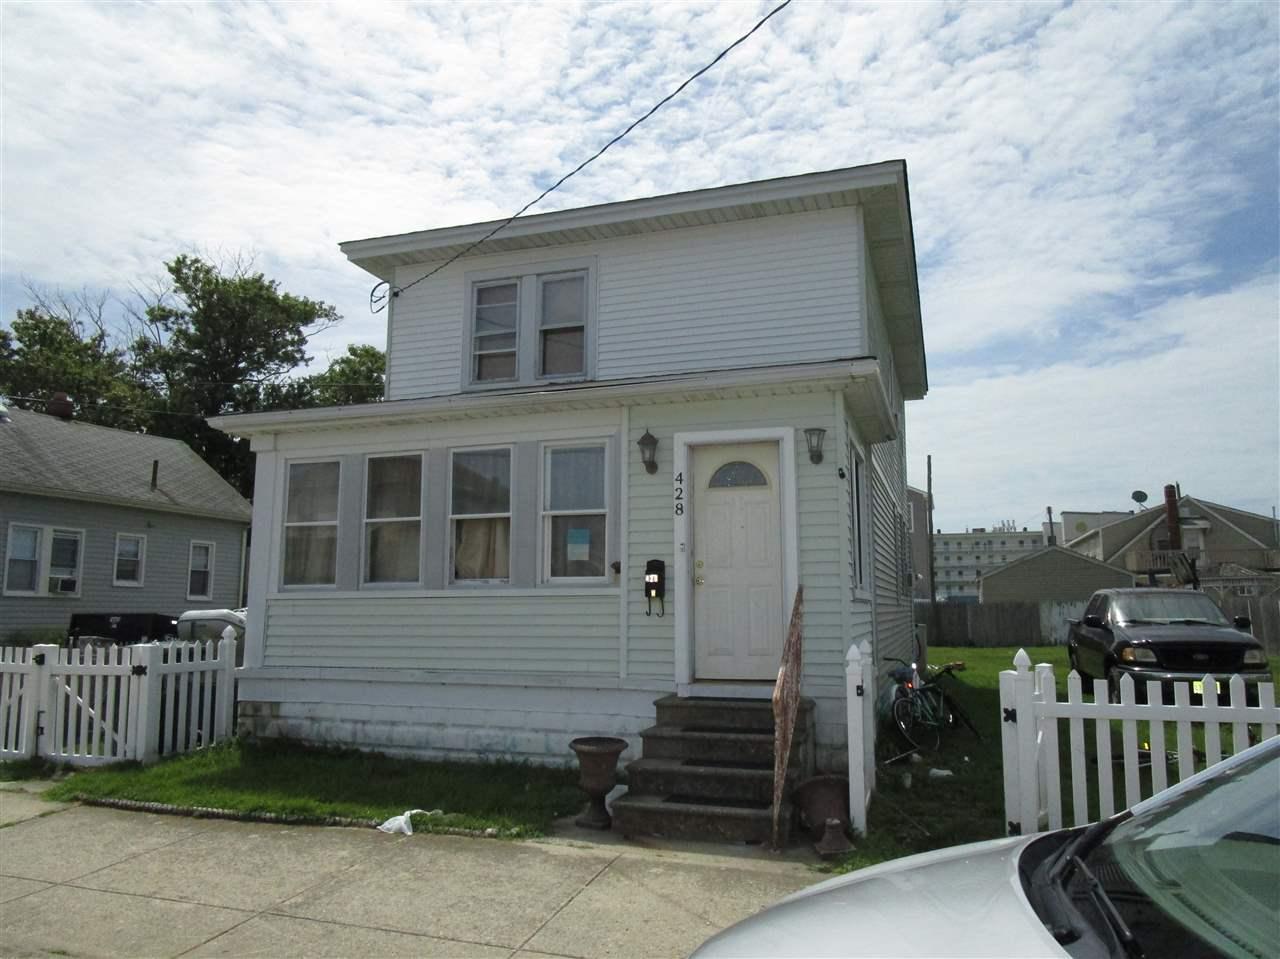 428 W Andrews, Wildwood, NJ 08260